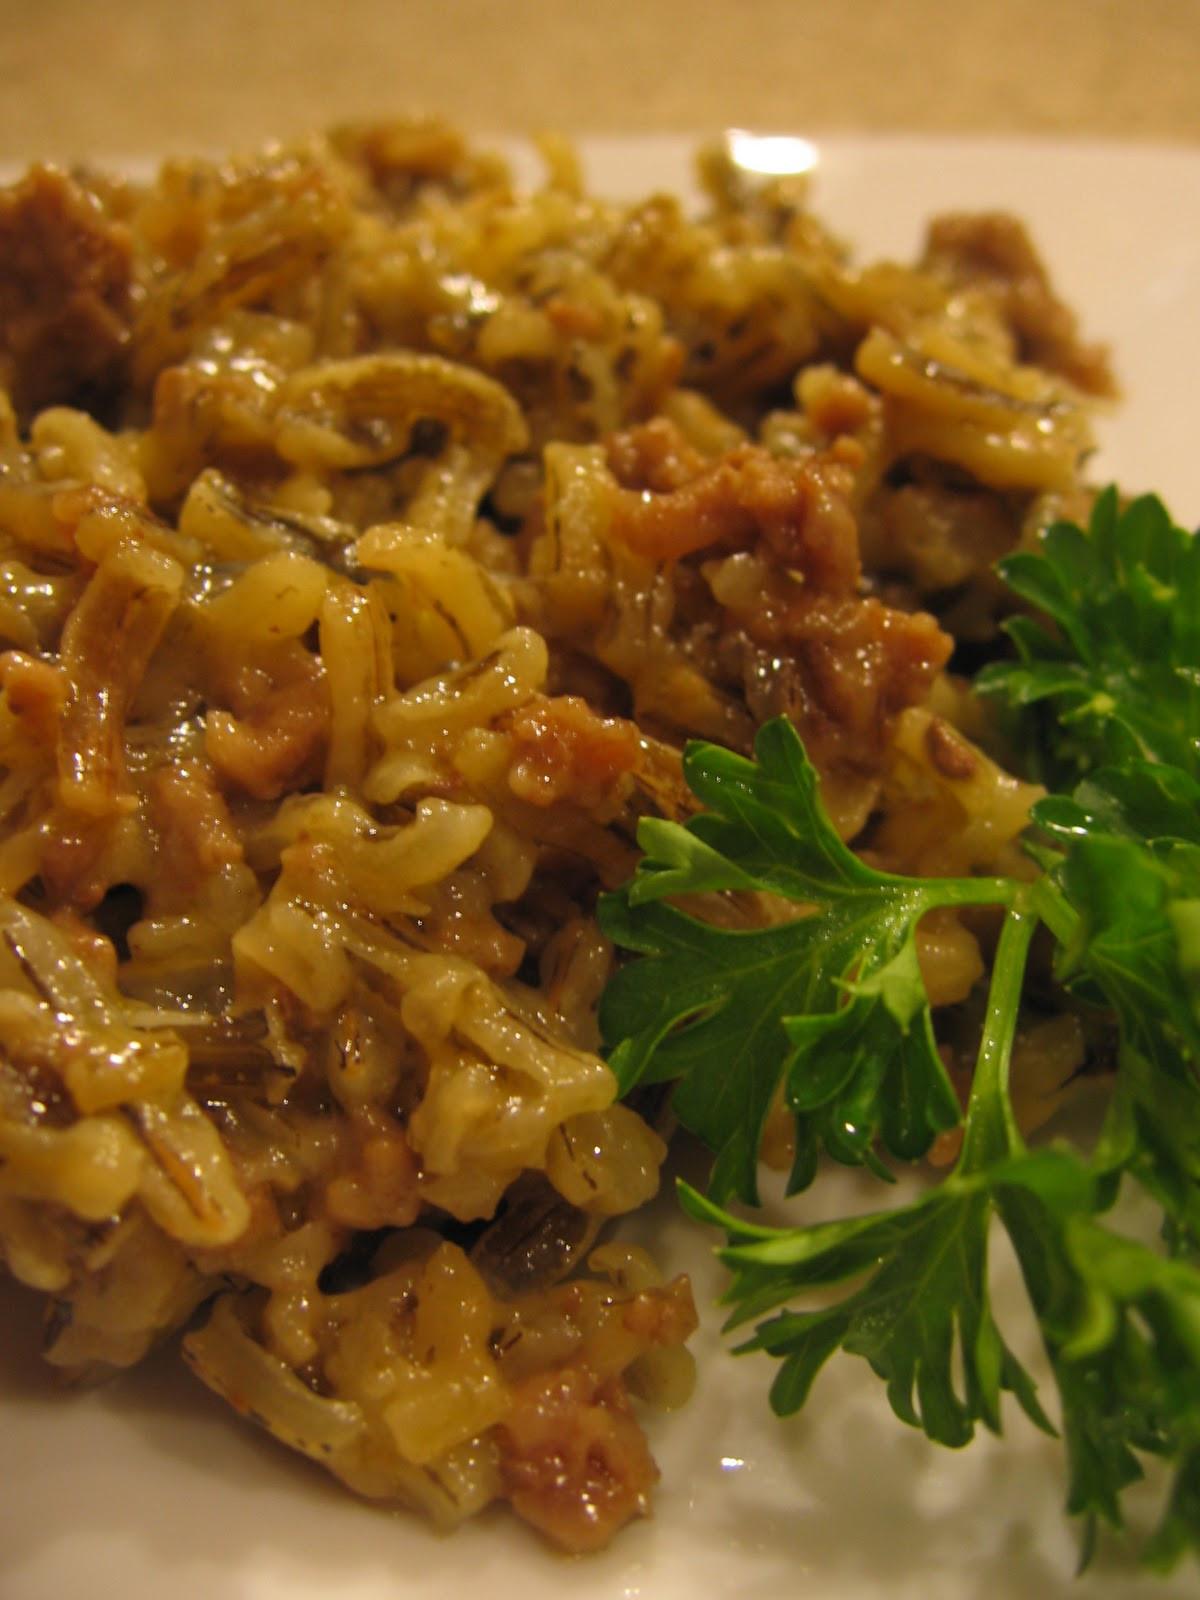 Minnesota Wild Rice  cookin up north Minnesota Wild Rice Hot dish